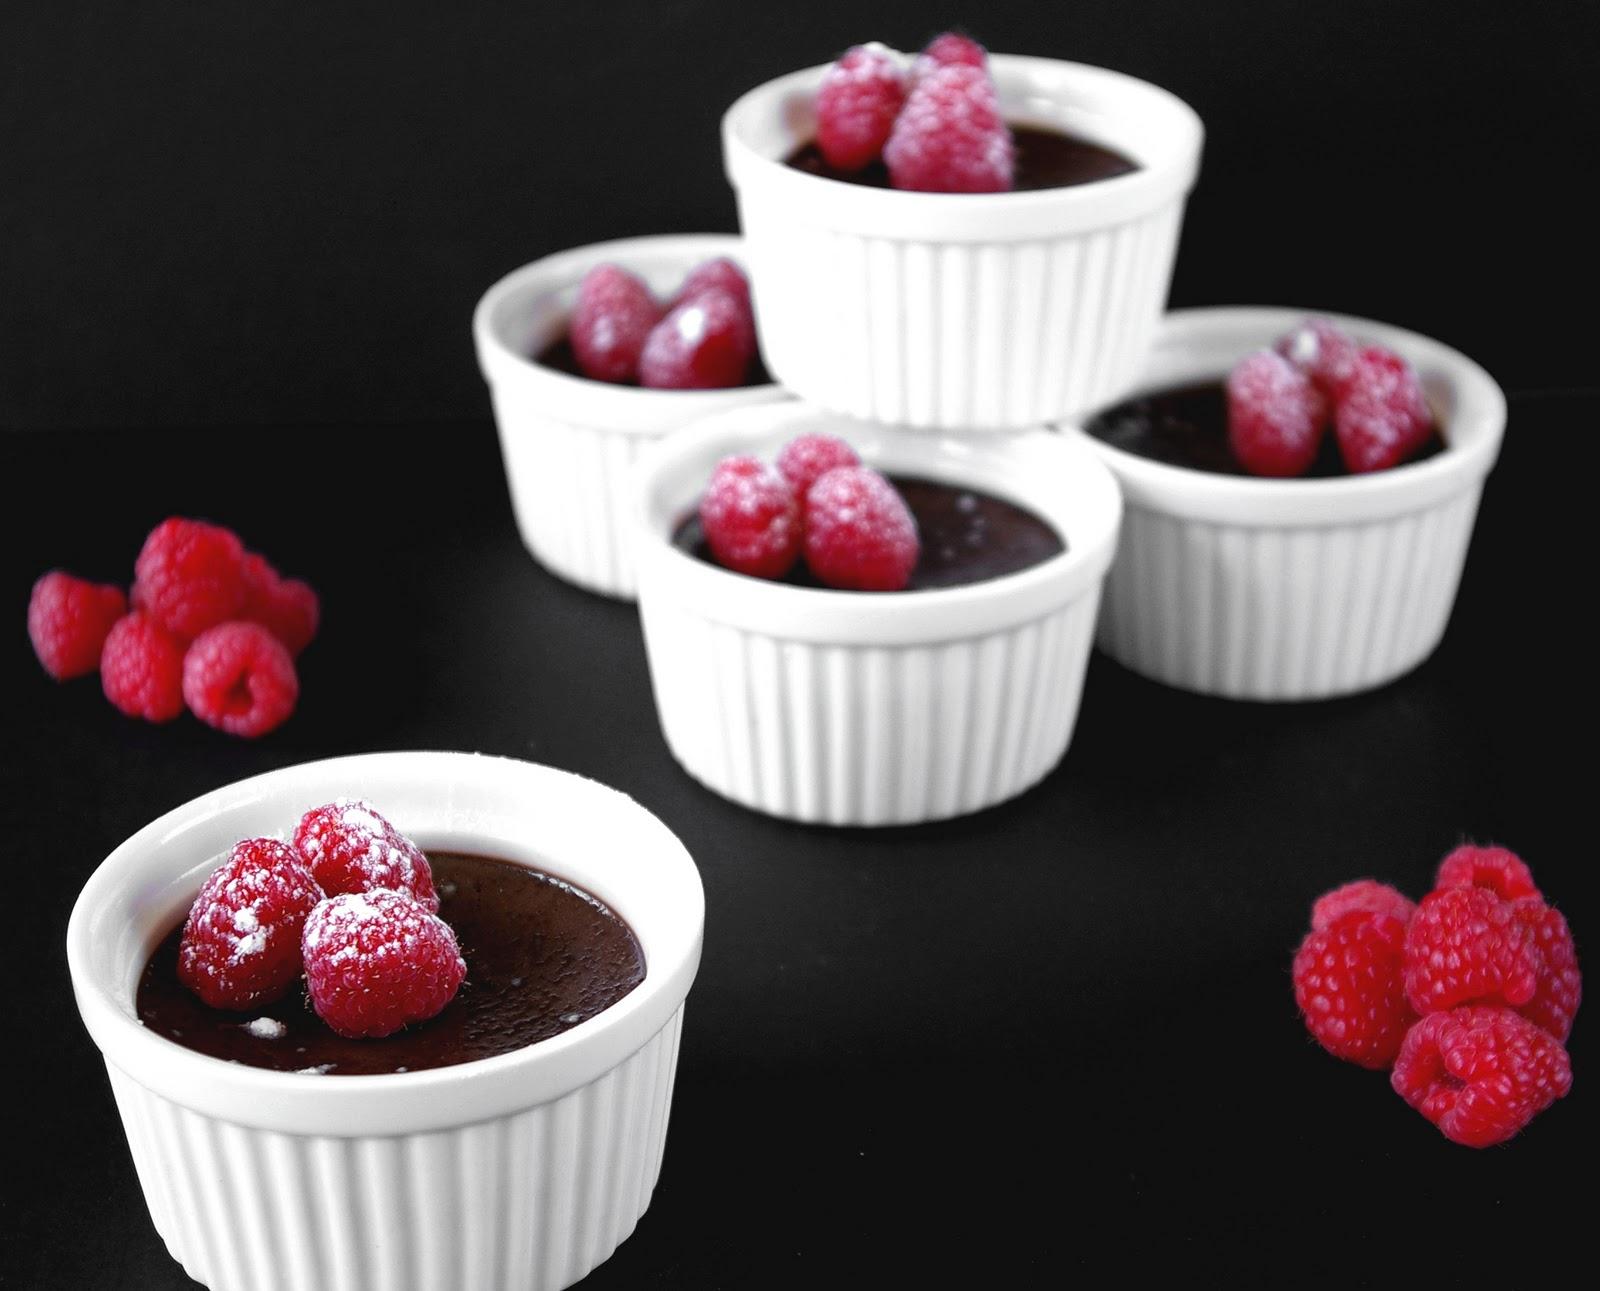 ... kokos creme chocolate hazelnut pots de creme with praline tastefood